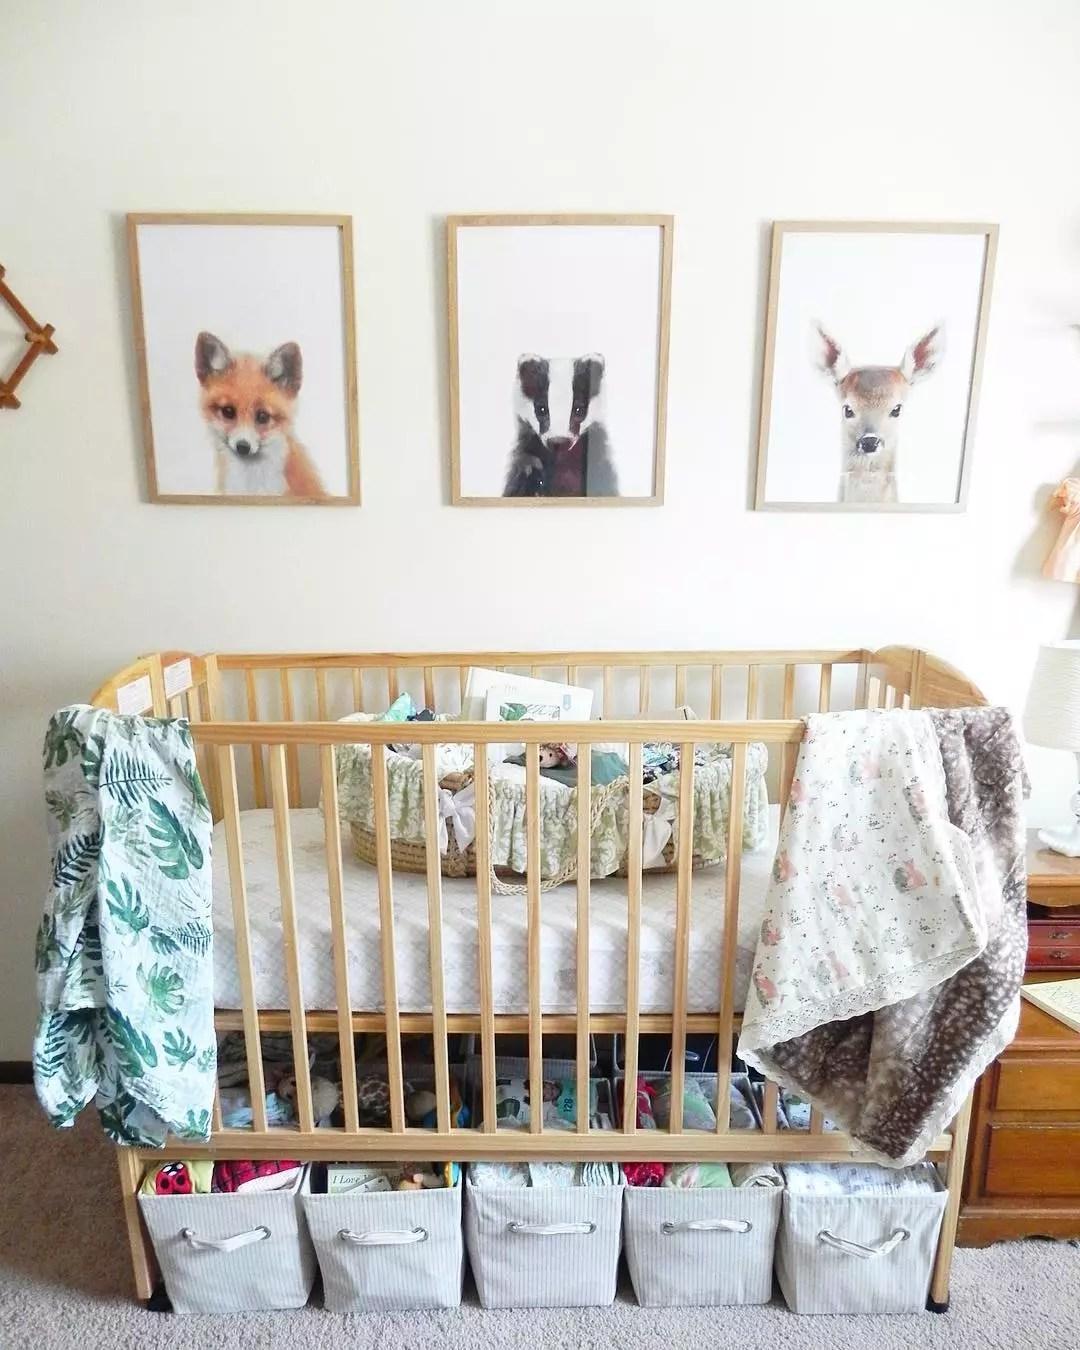 Storage bins under baby crib in small home. Photo by Instagram user @4_little_1